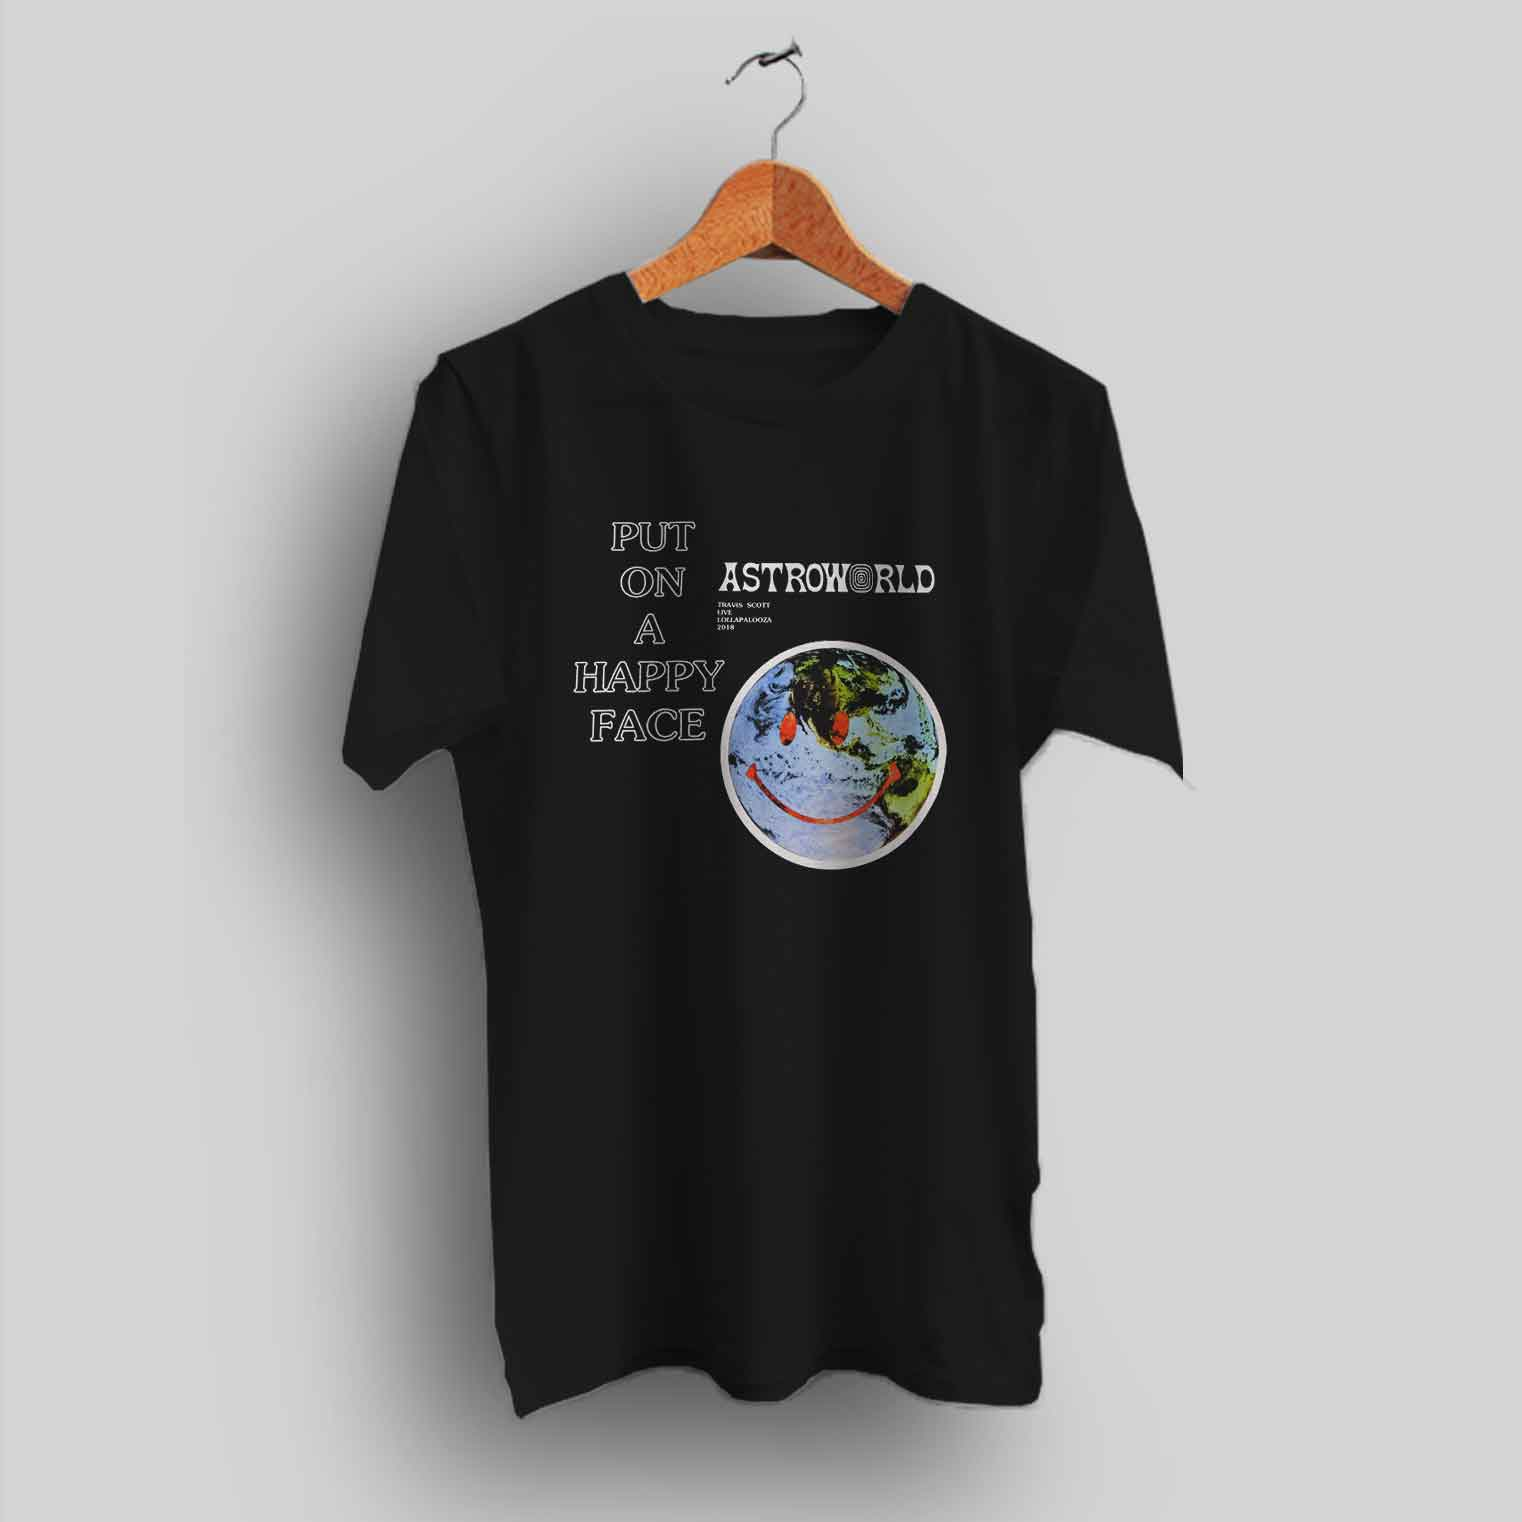 62e8209d Travis Scott Astroworld Live Lollapalooza Urban T Shirt - HotVero.com